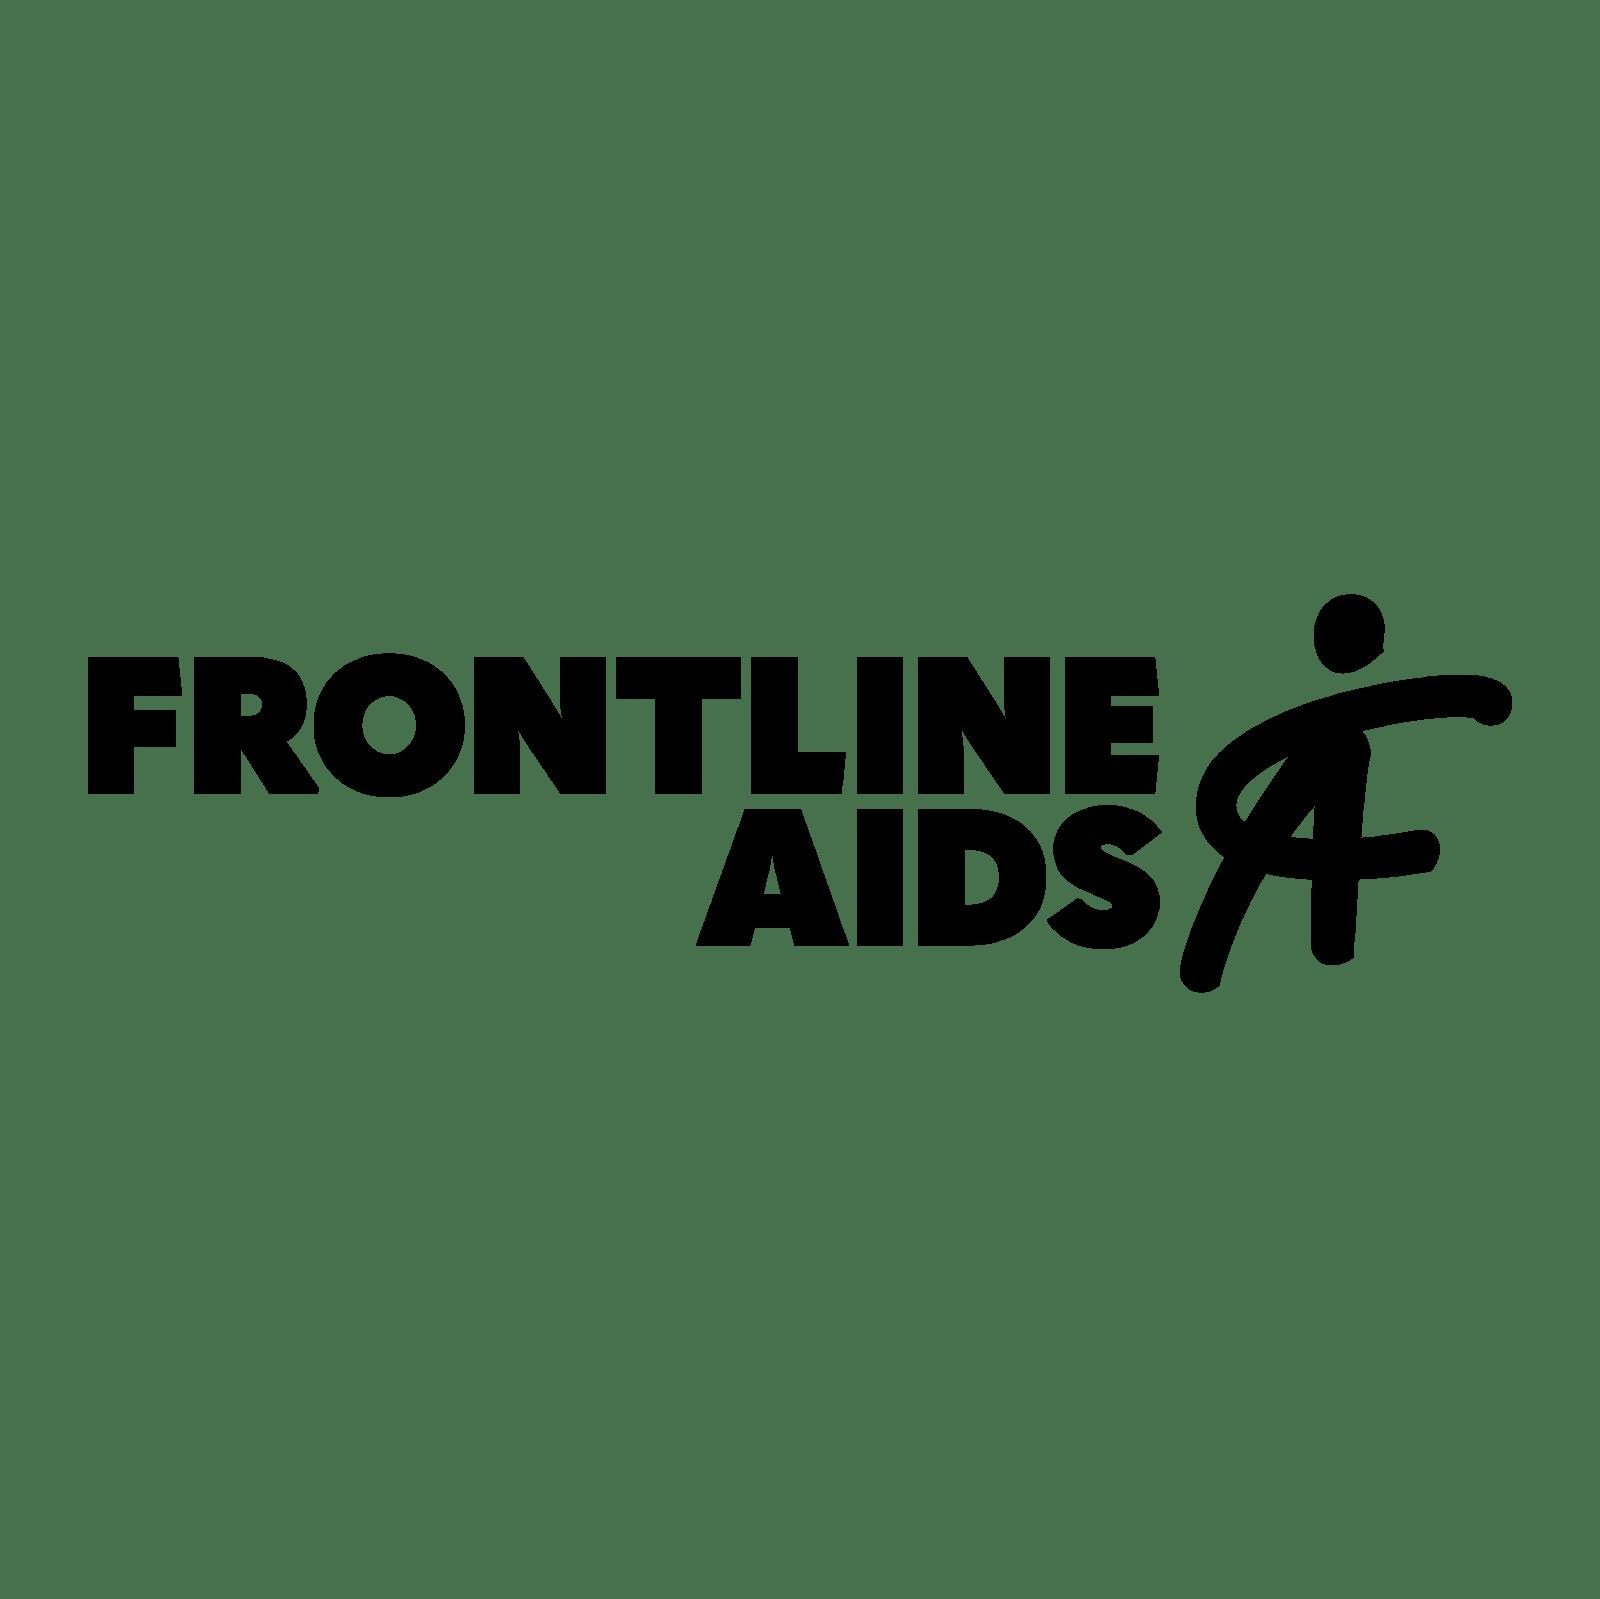 FrontlineAIDS_PrimaryLogo_Black_RGB copy